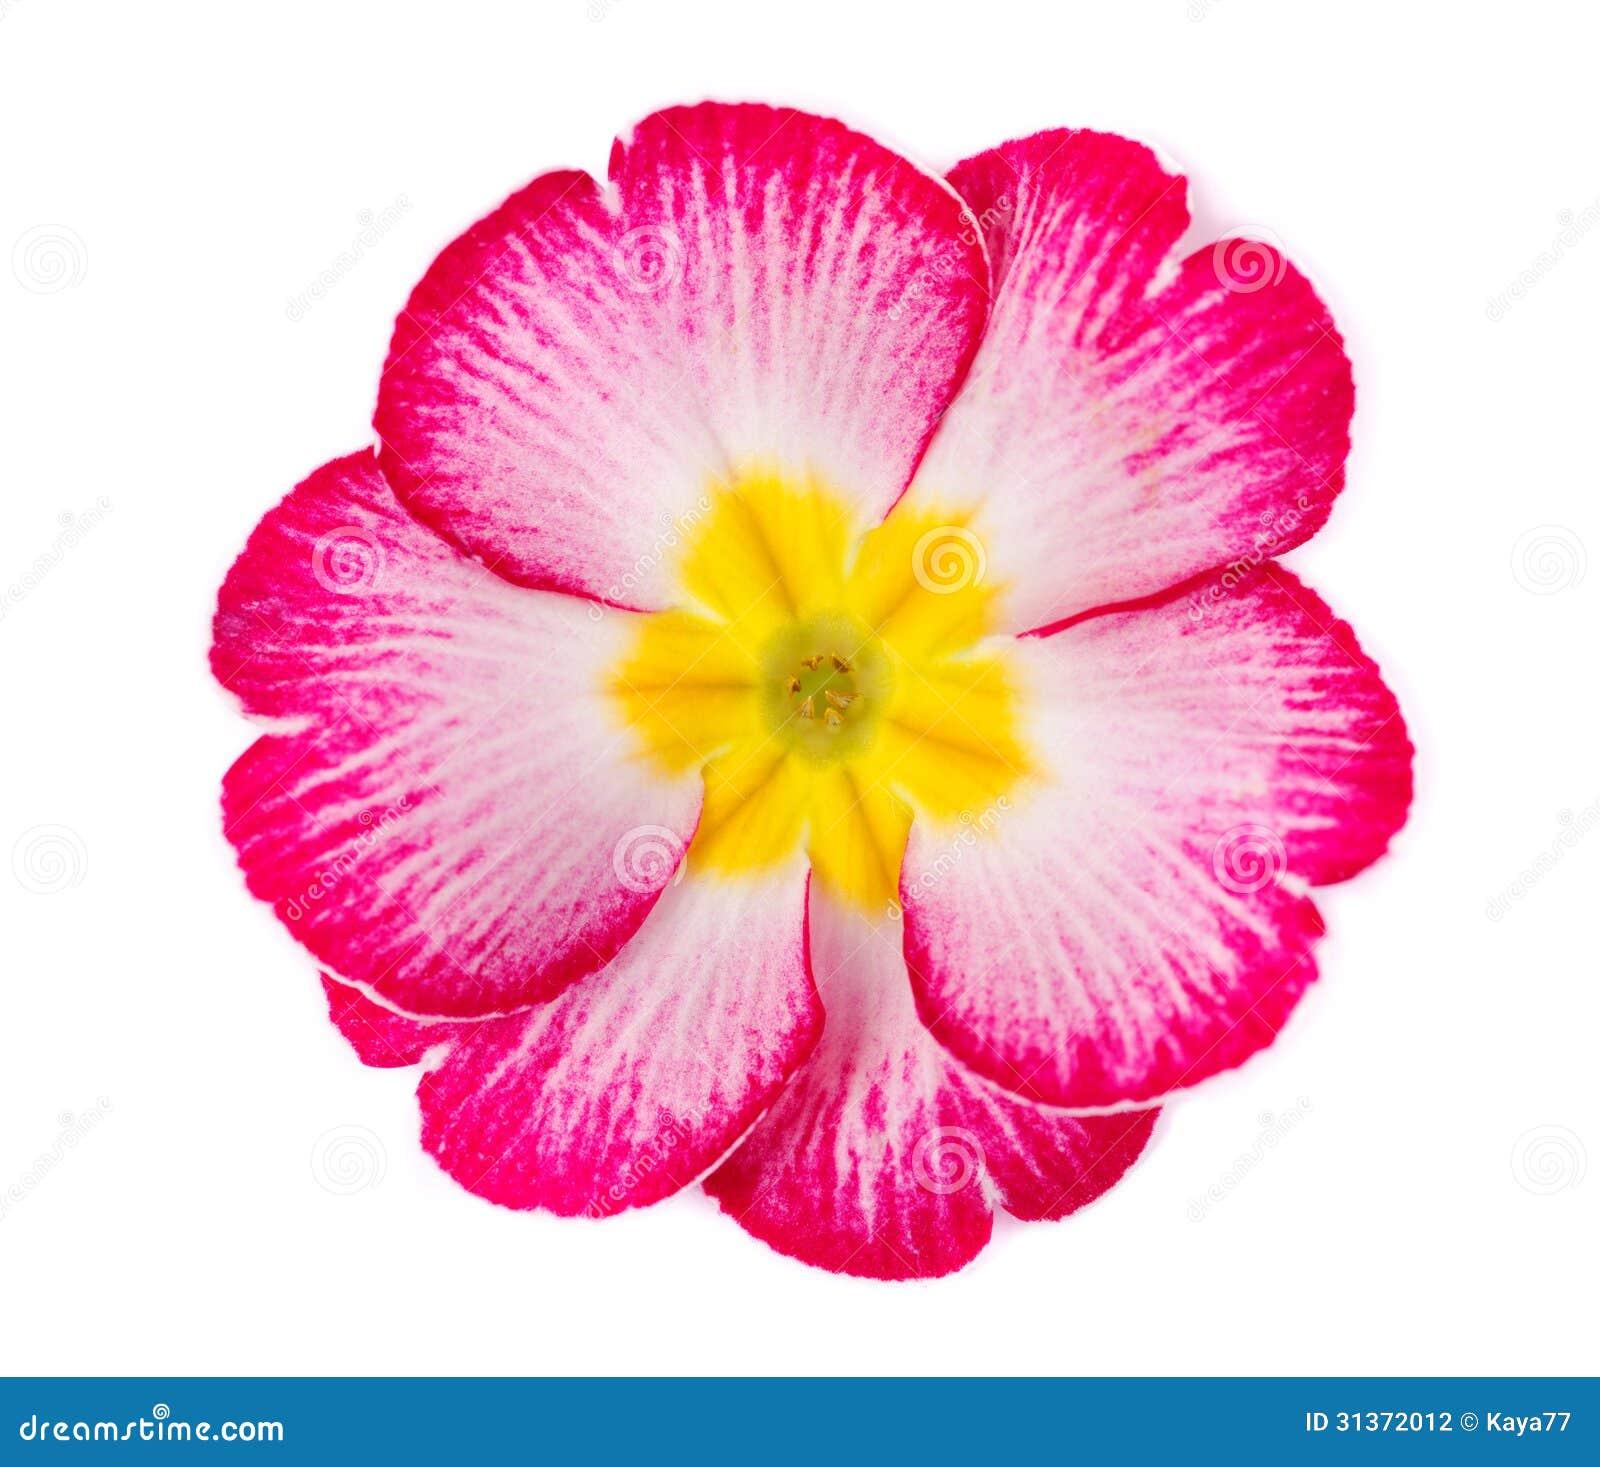 Primrose flower stock photo image of beauty botanic 31372012 primrose flower mightylinksfo